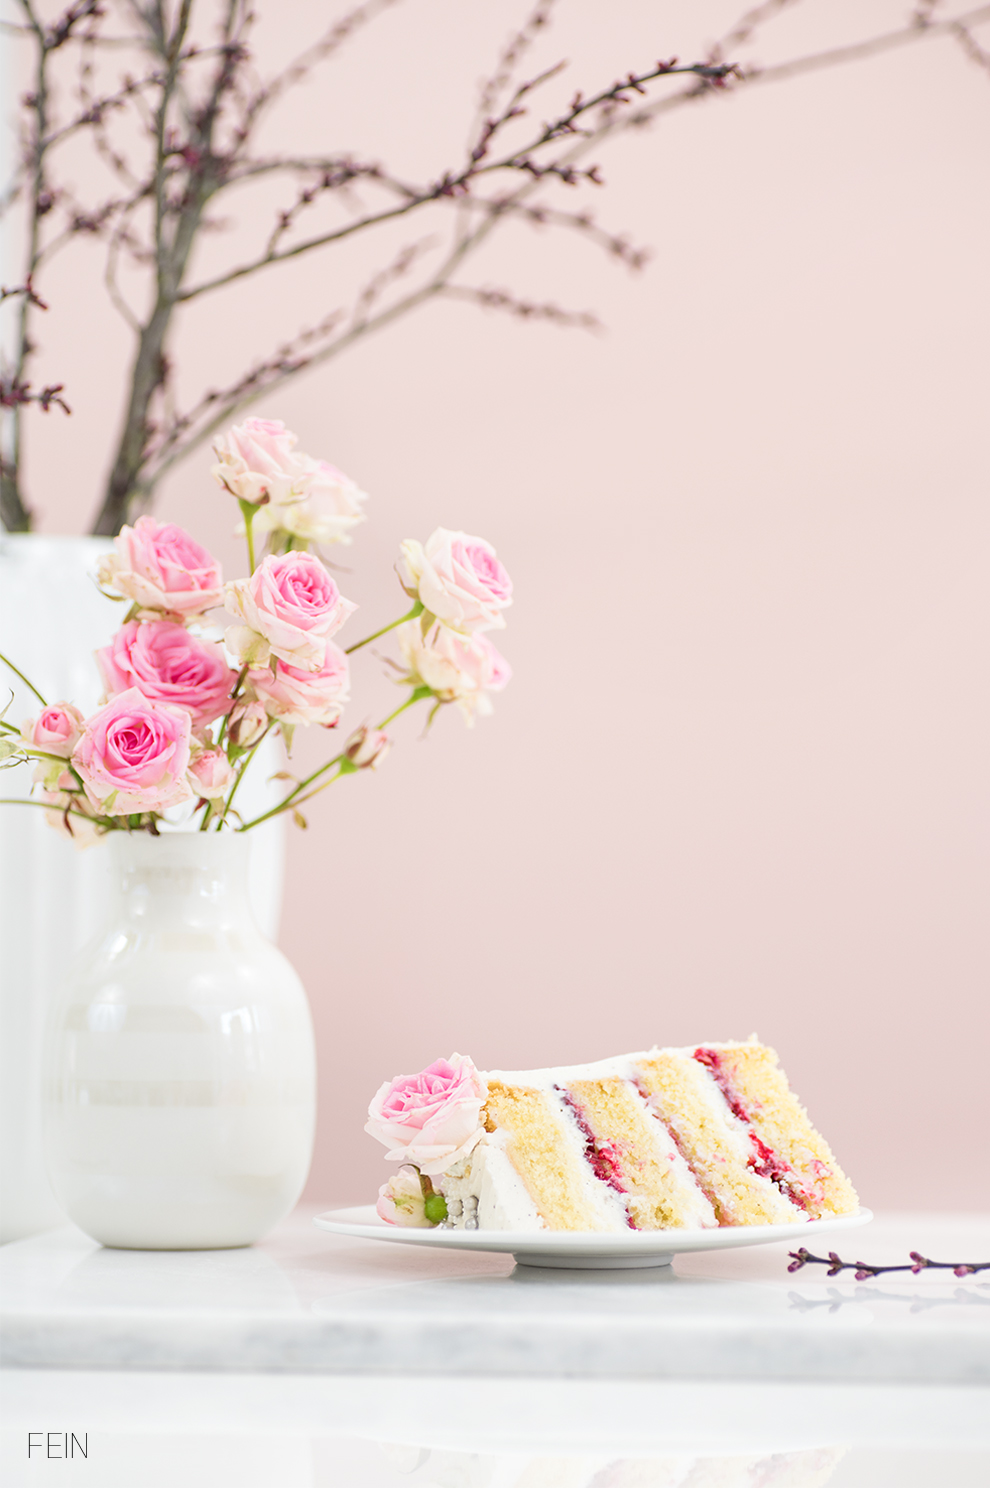 Geburtstag Cake Frühling Rosen